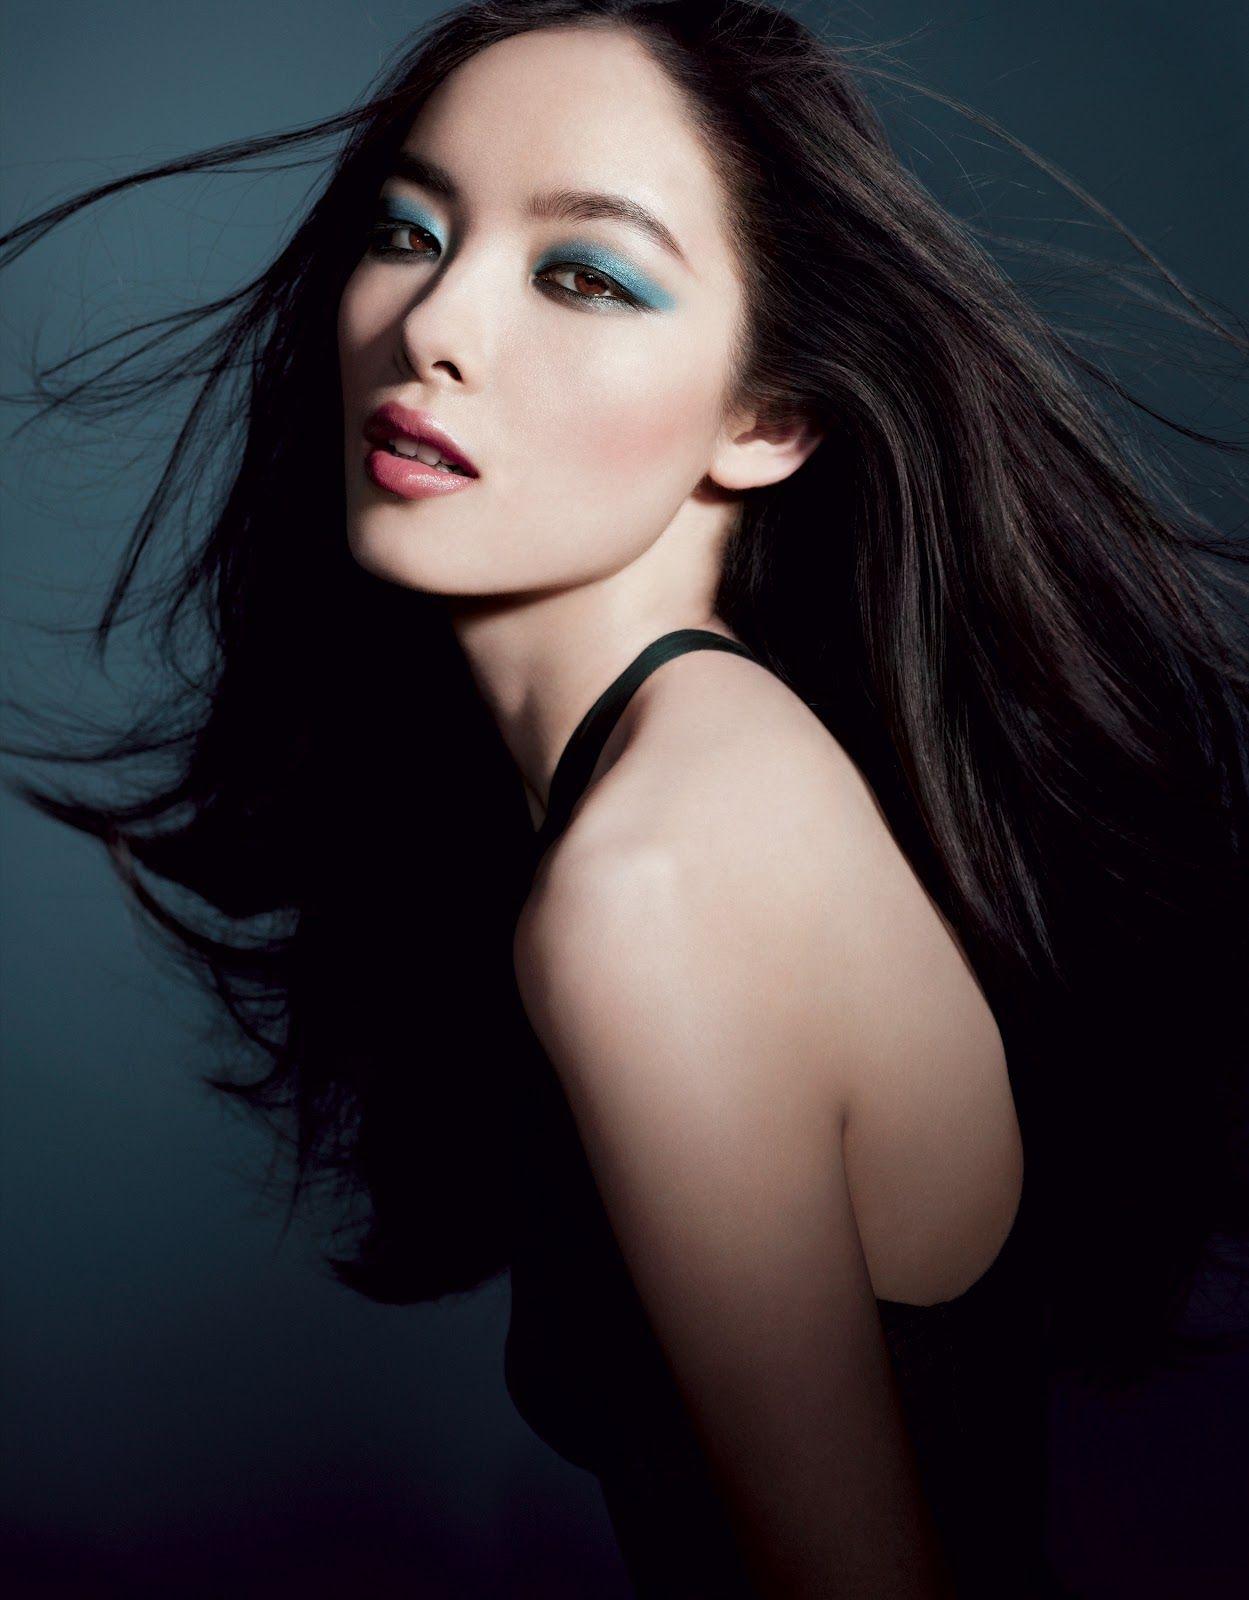 Abstand wählen attraktive Farbe professioneller Verkauf ASIAN MODELS BLOG: AD CAMPAIGN: Sun Fei Fei for Giorgio ...